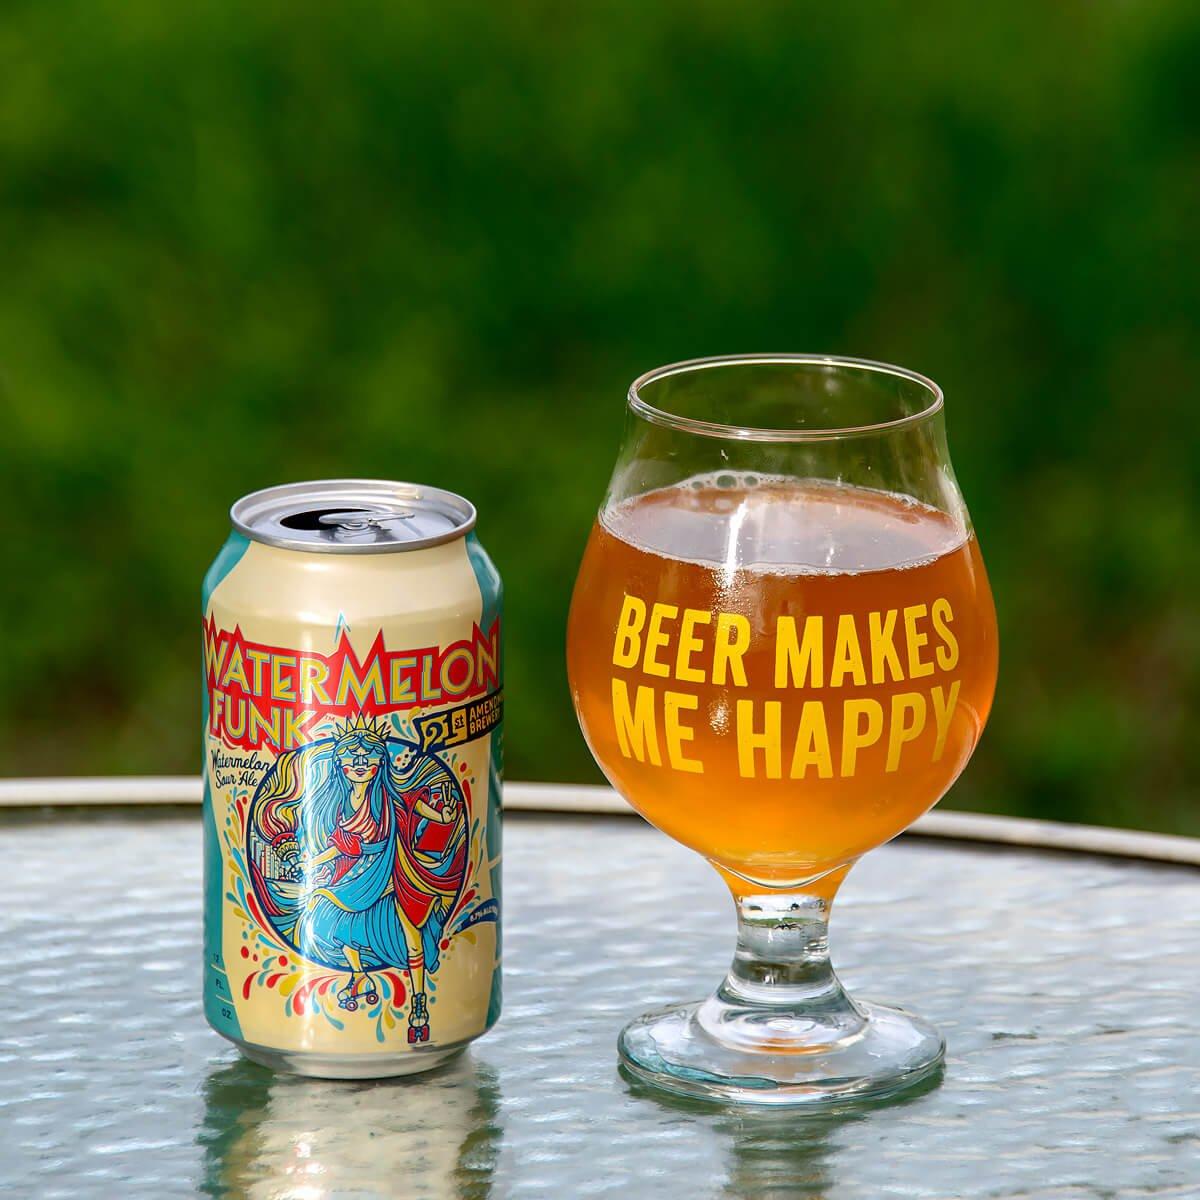 Watermelon Funk, an American Wild Ale brewed by 21st Amendment Brewery.